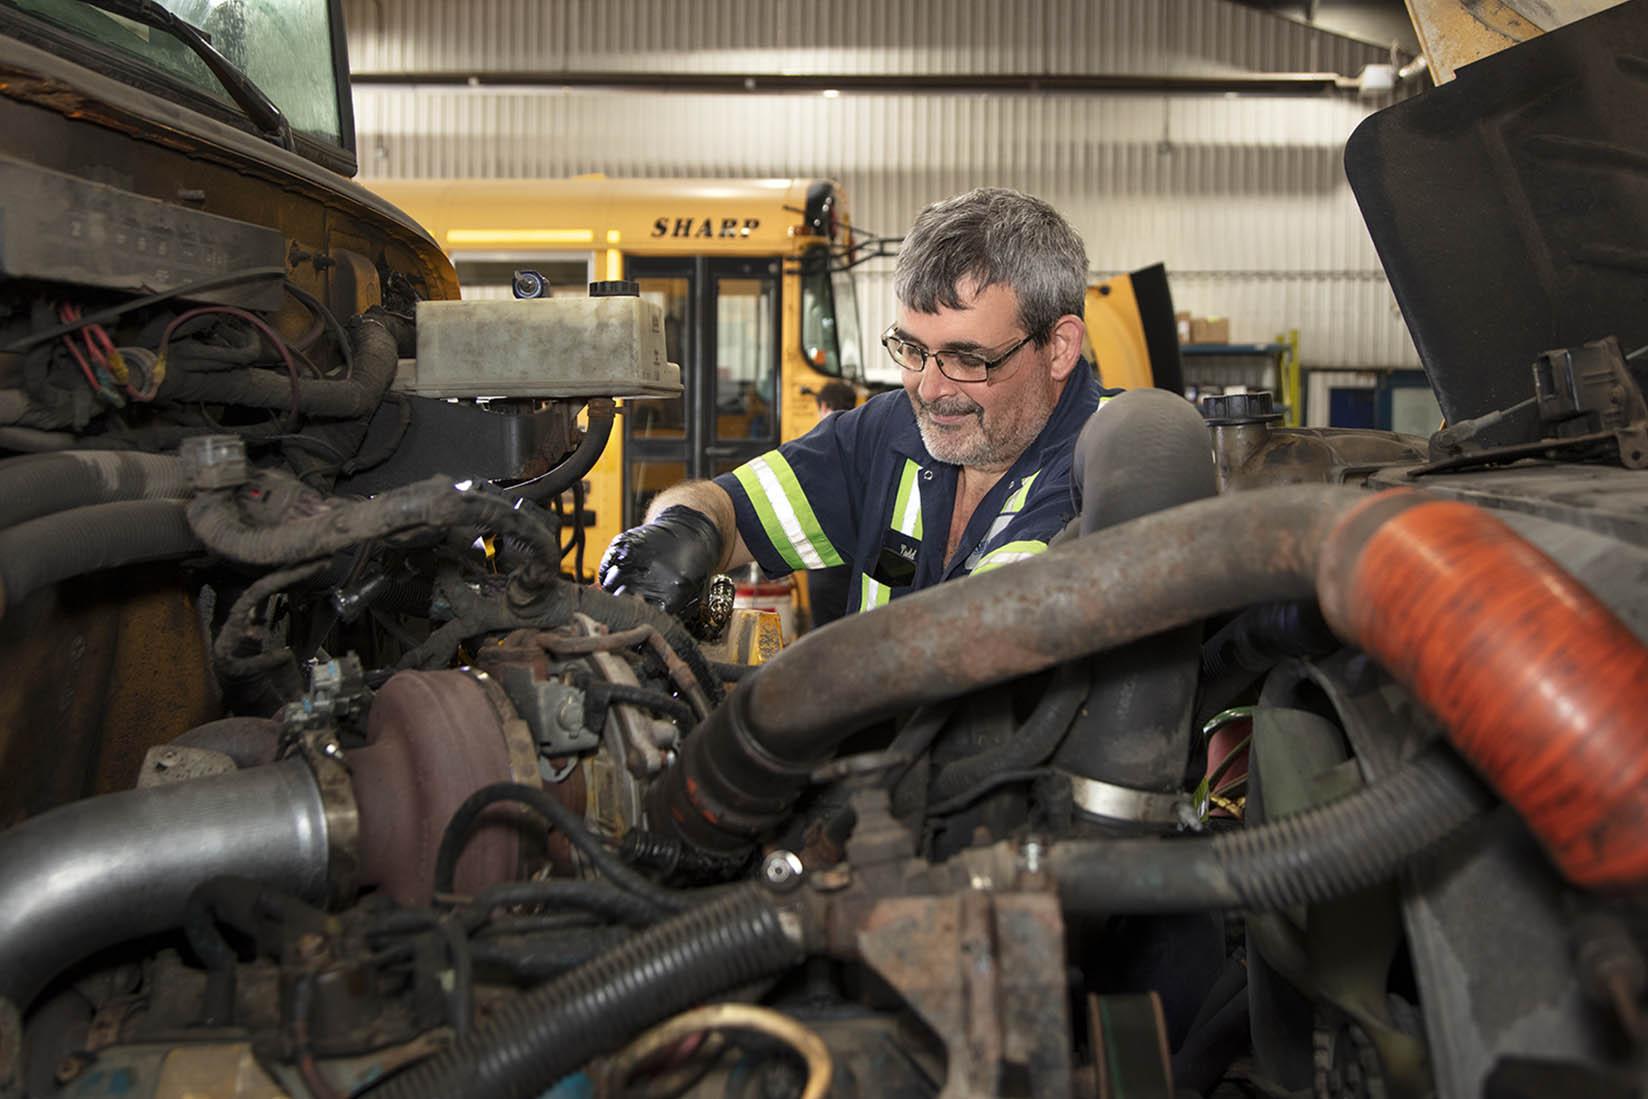 Sharp mechanic: 310T or 310S Truck and coach technician